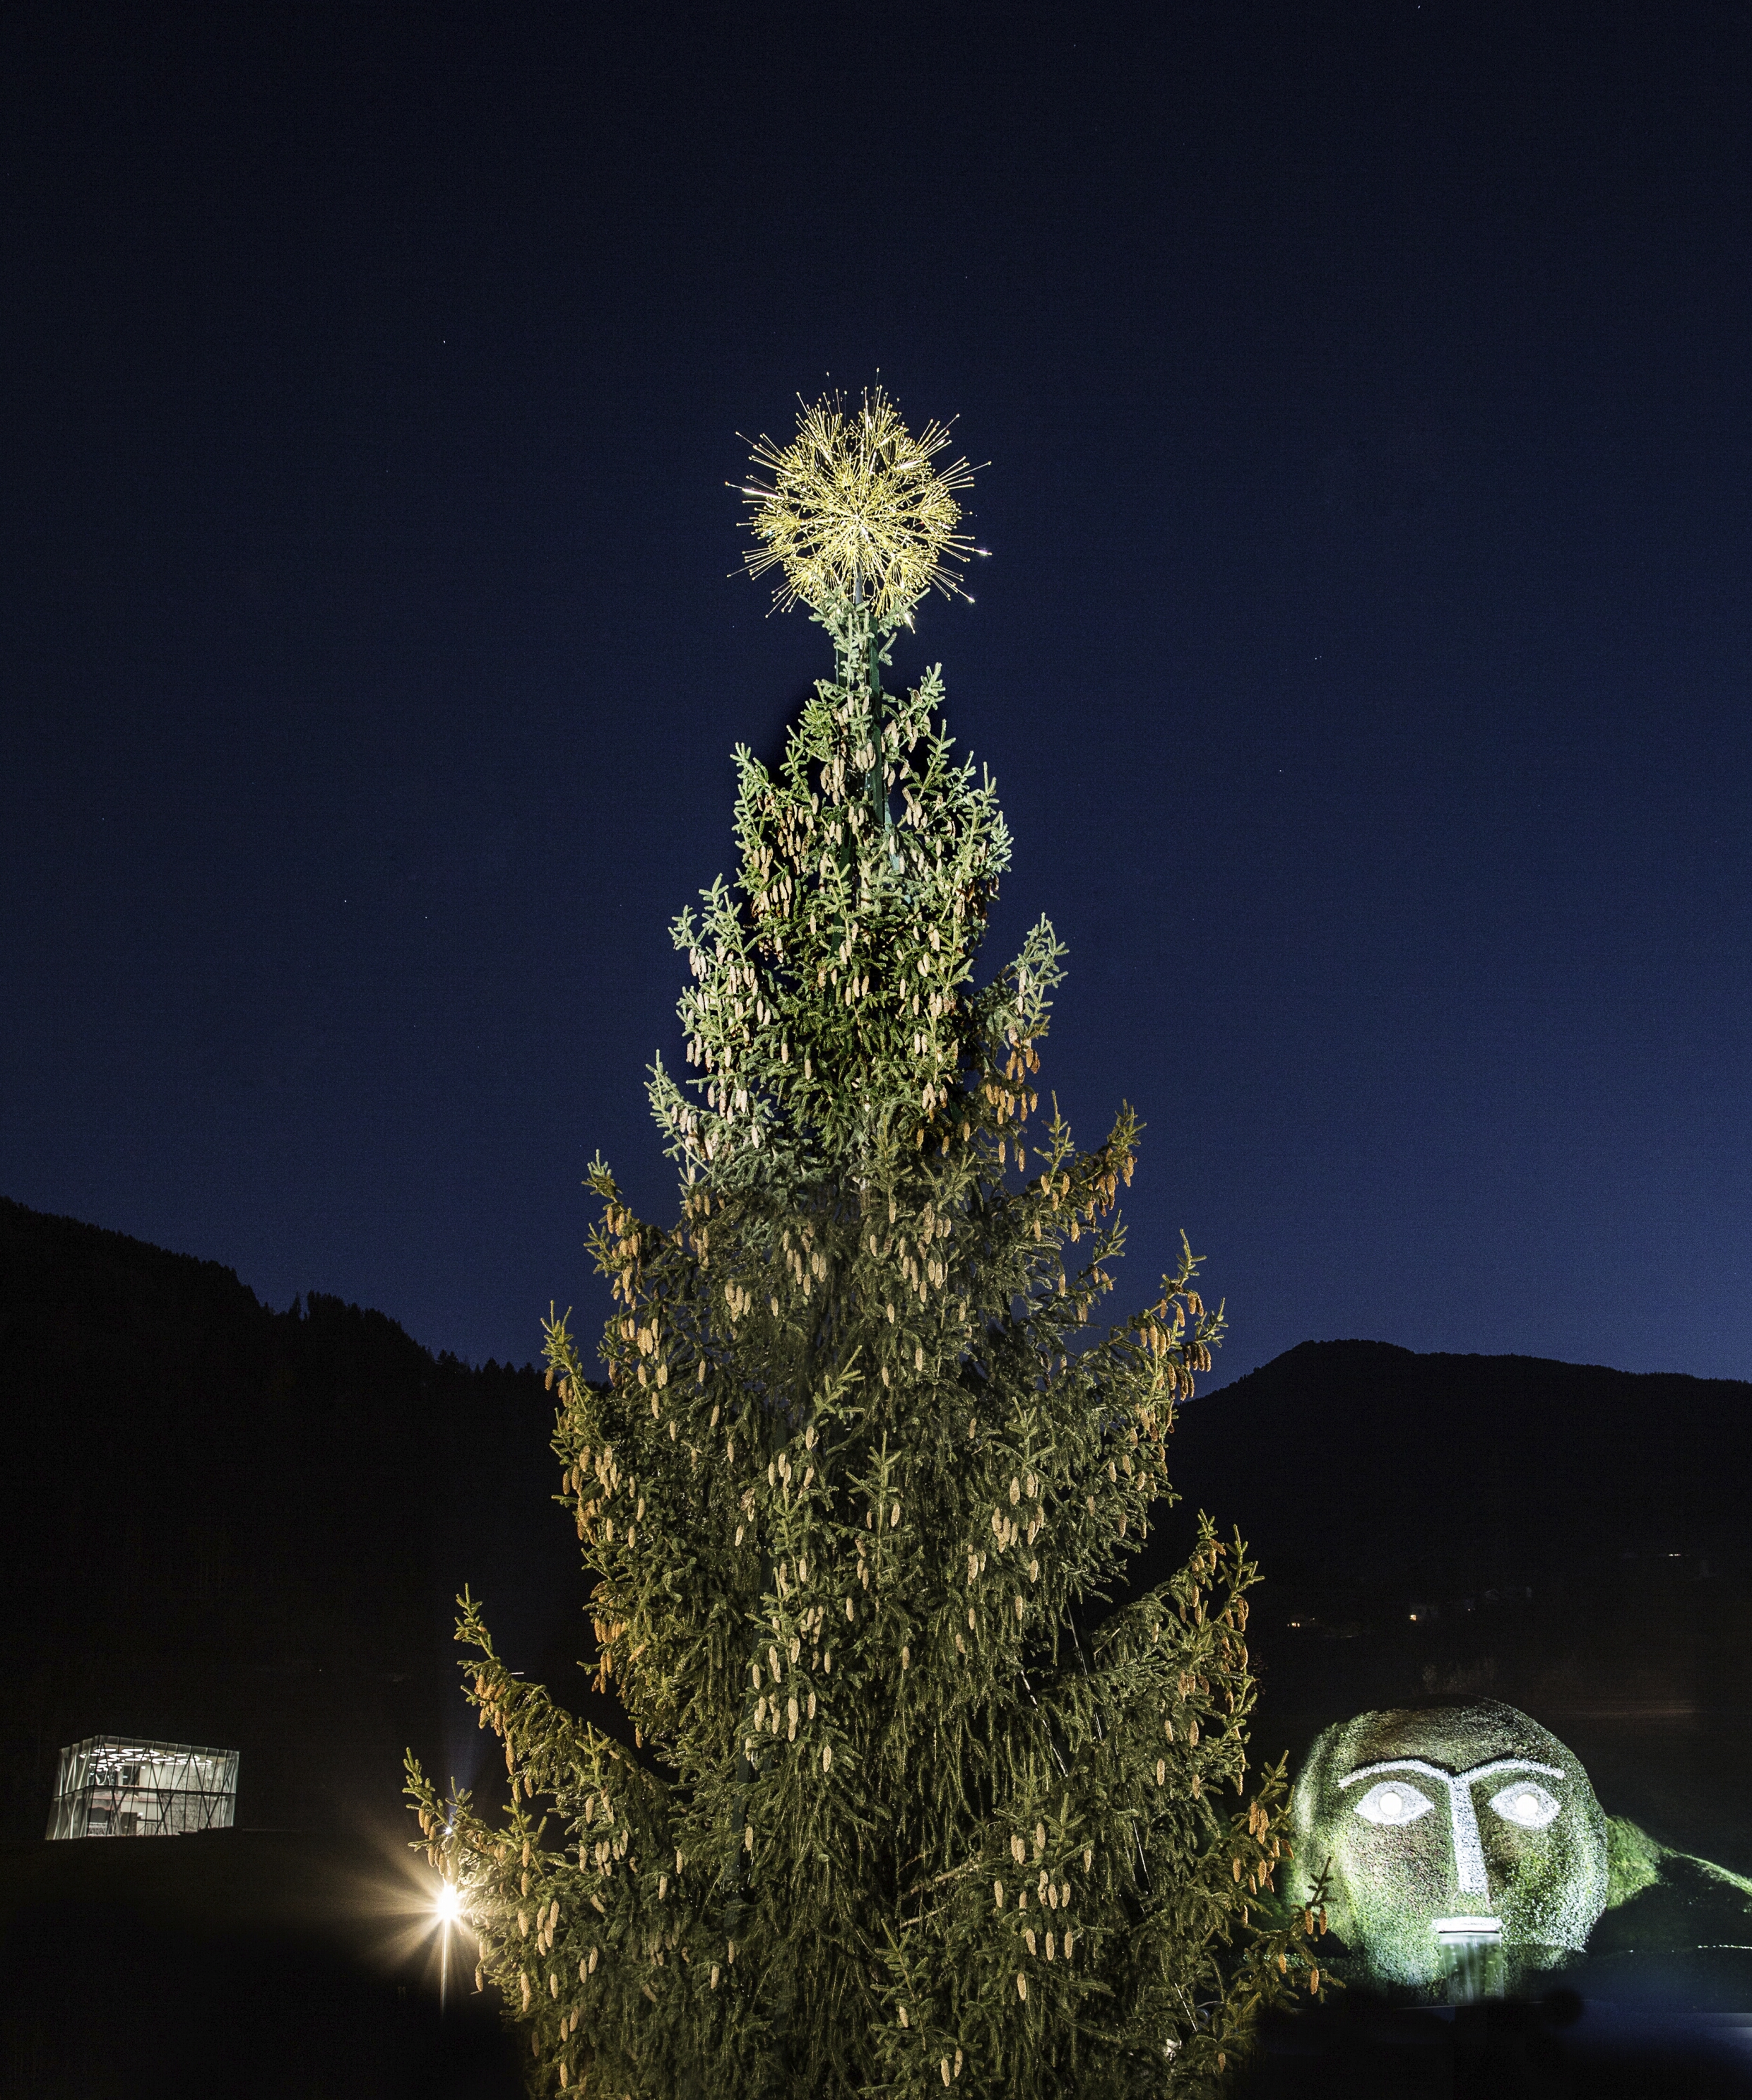 Christmas Tree Swarovski Kristallwelten